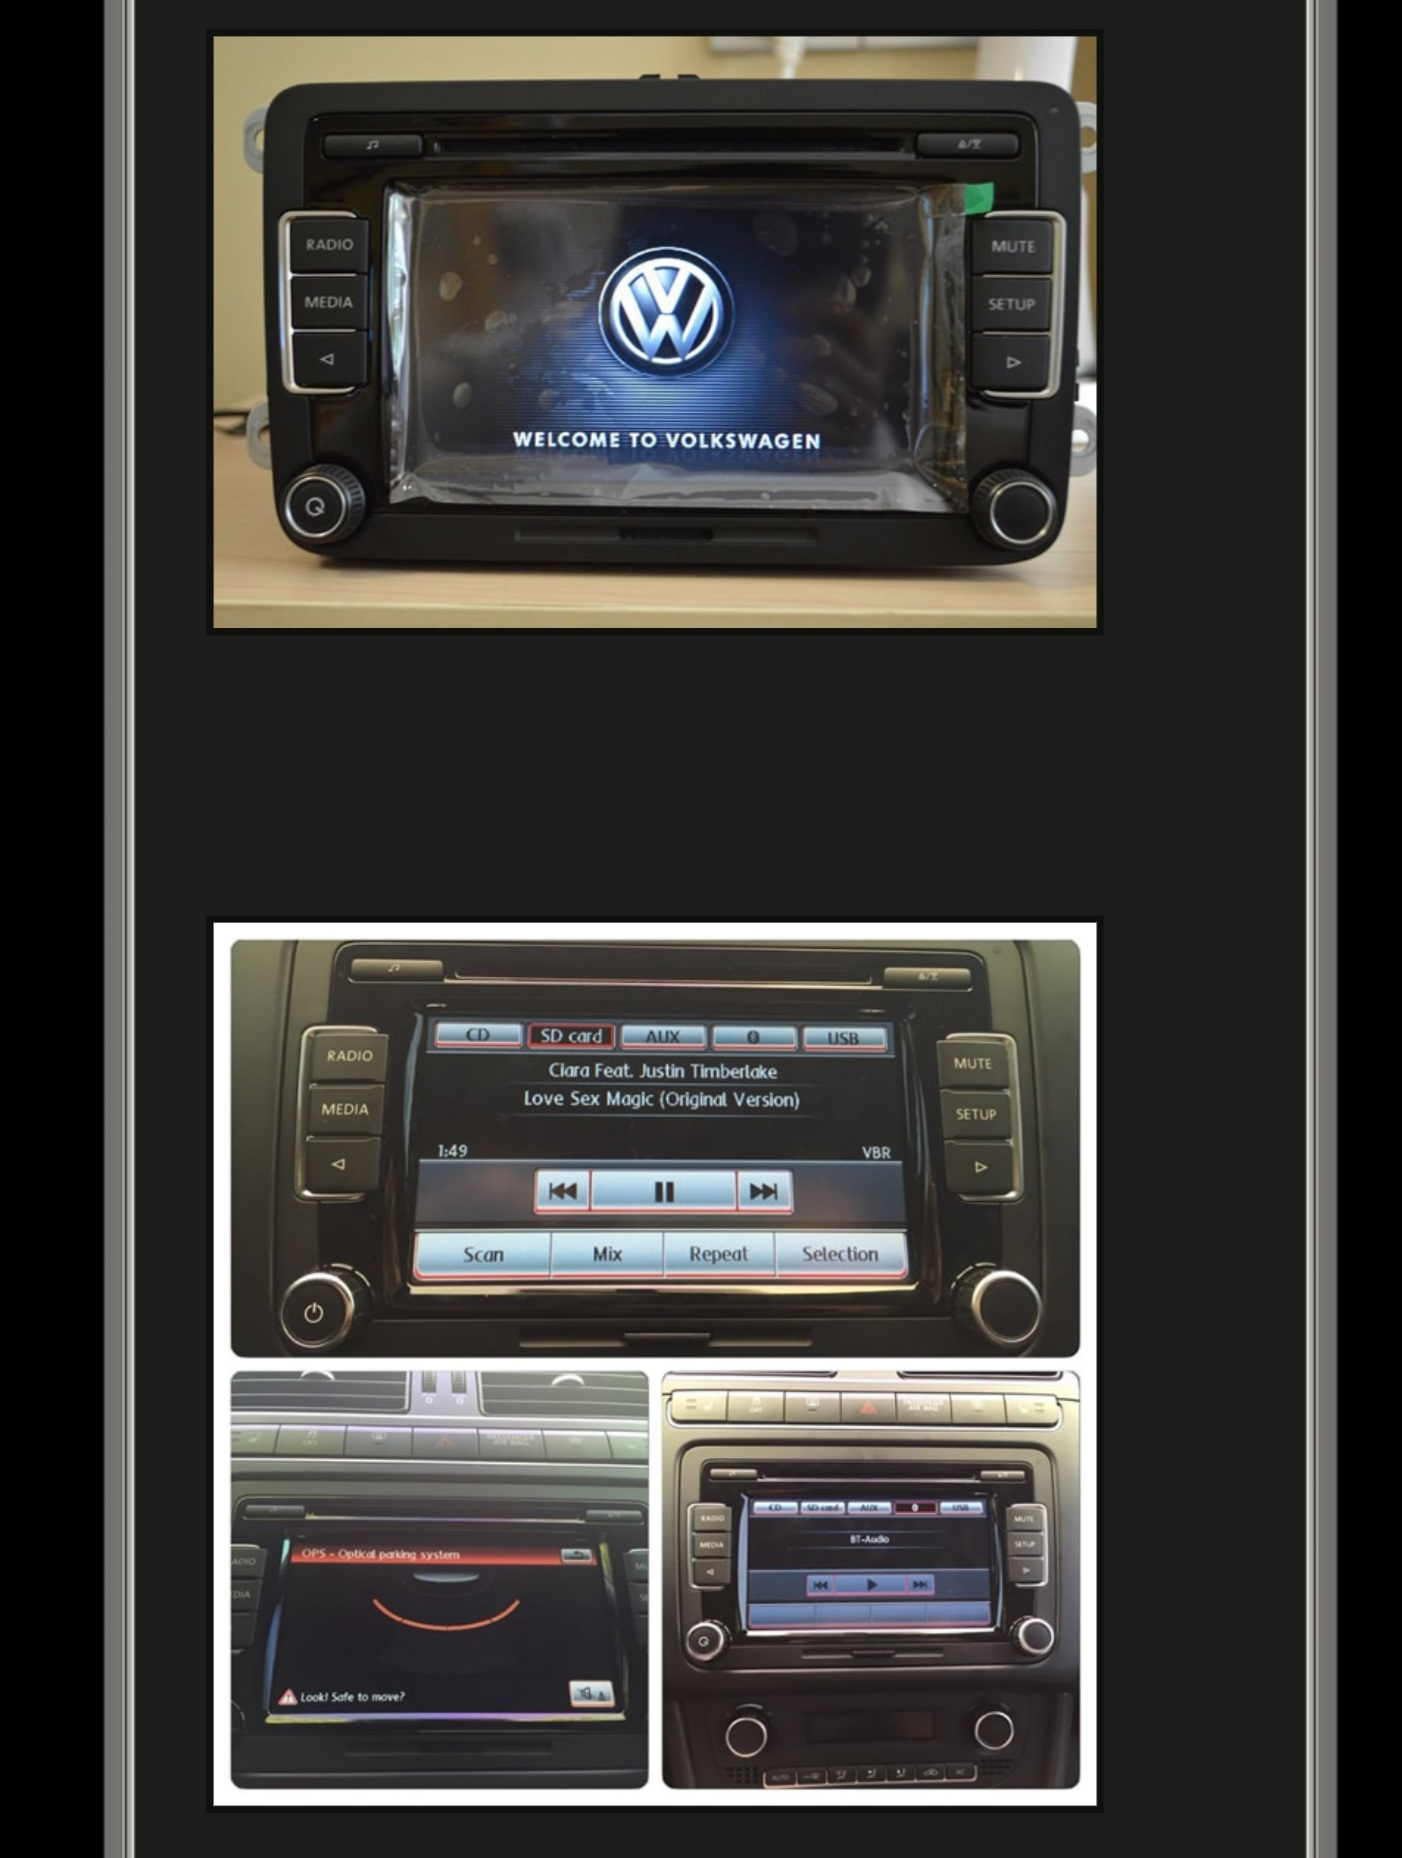 VW Radio RCD510 Touchscreen